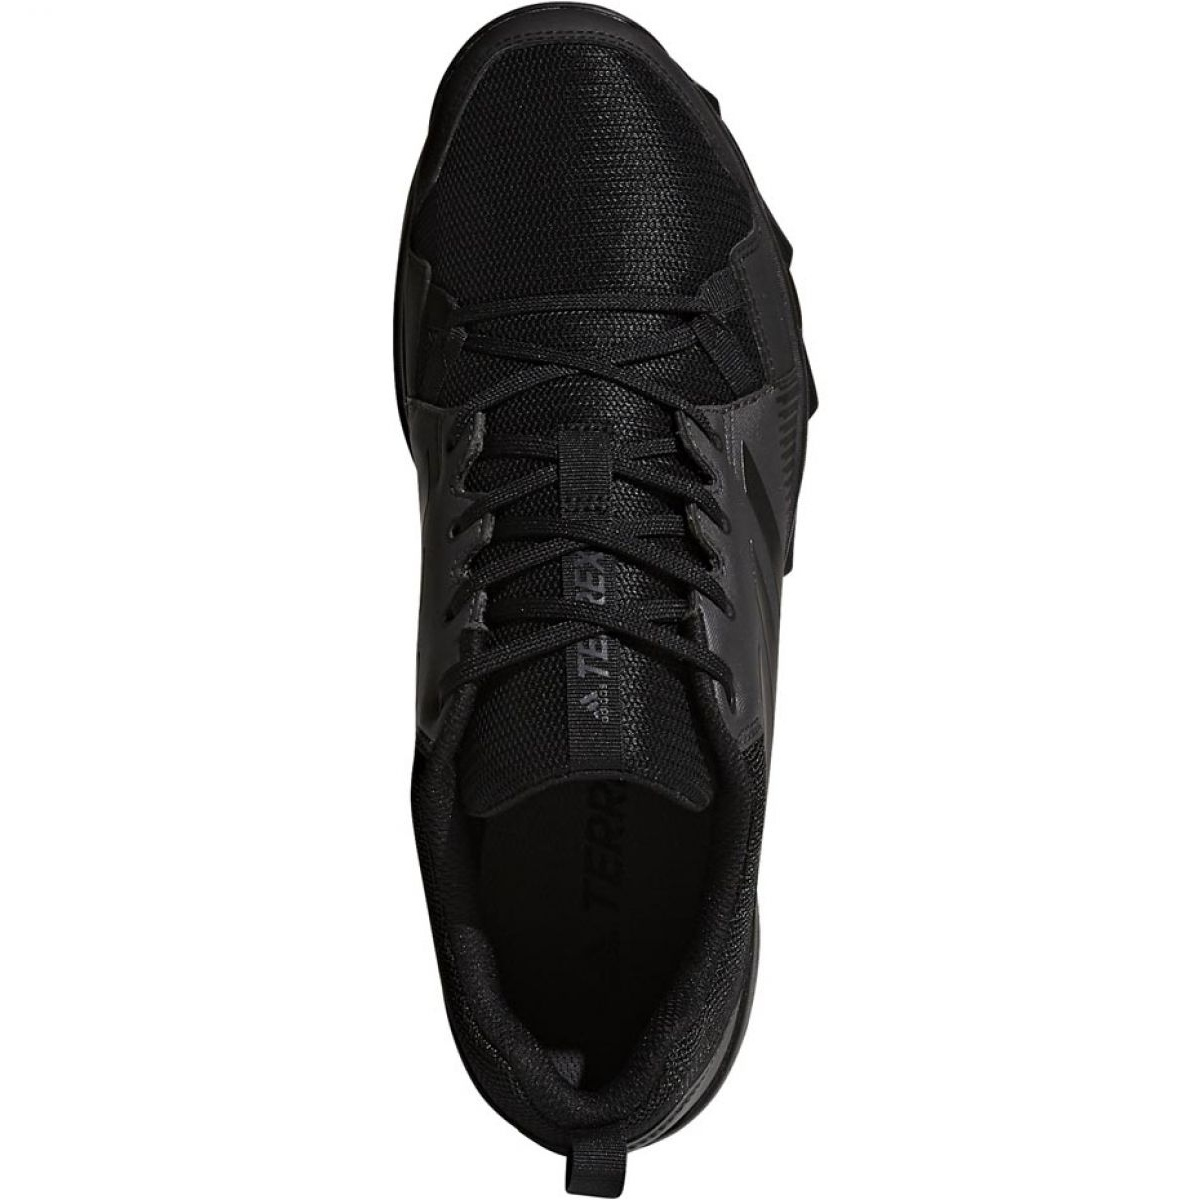 Schwarz Adidas Terrex Tracerocker M S80898 Schuhe